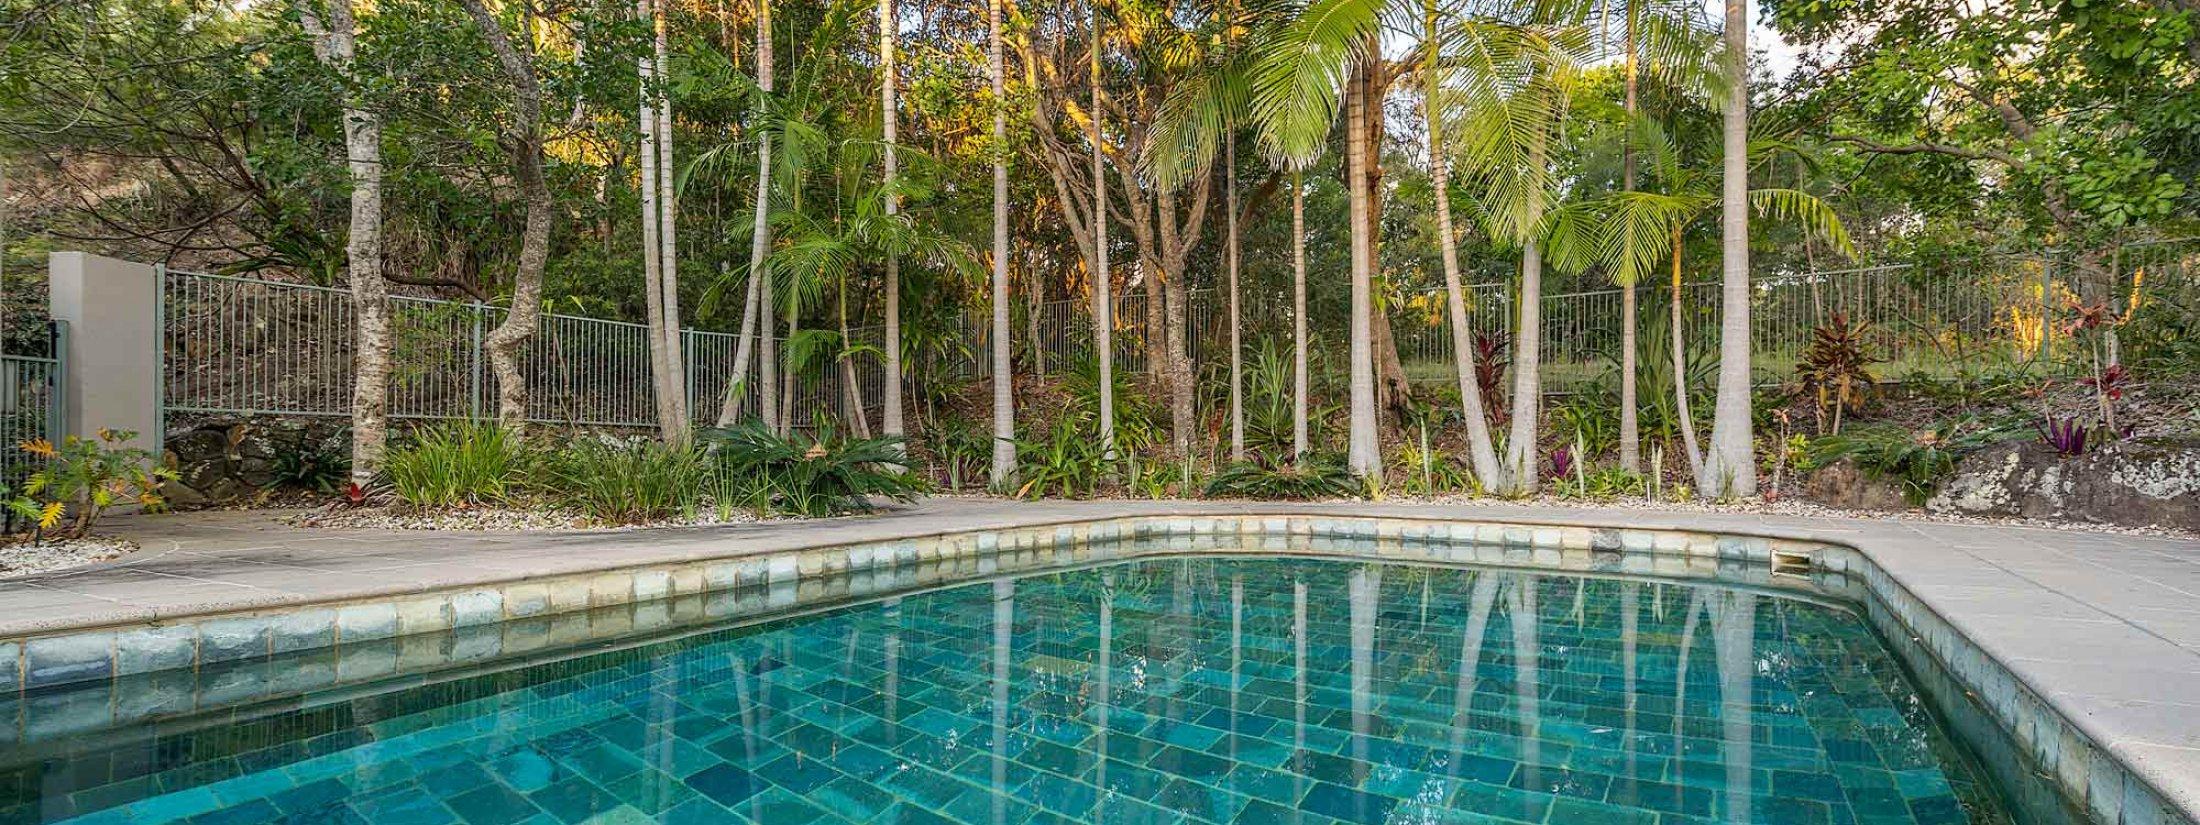 11 James Cook - Byron Bay - Pool